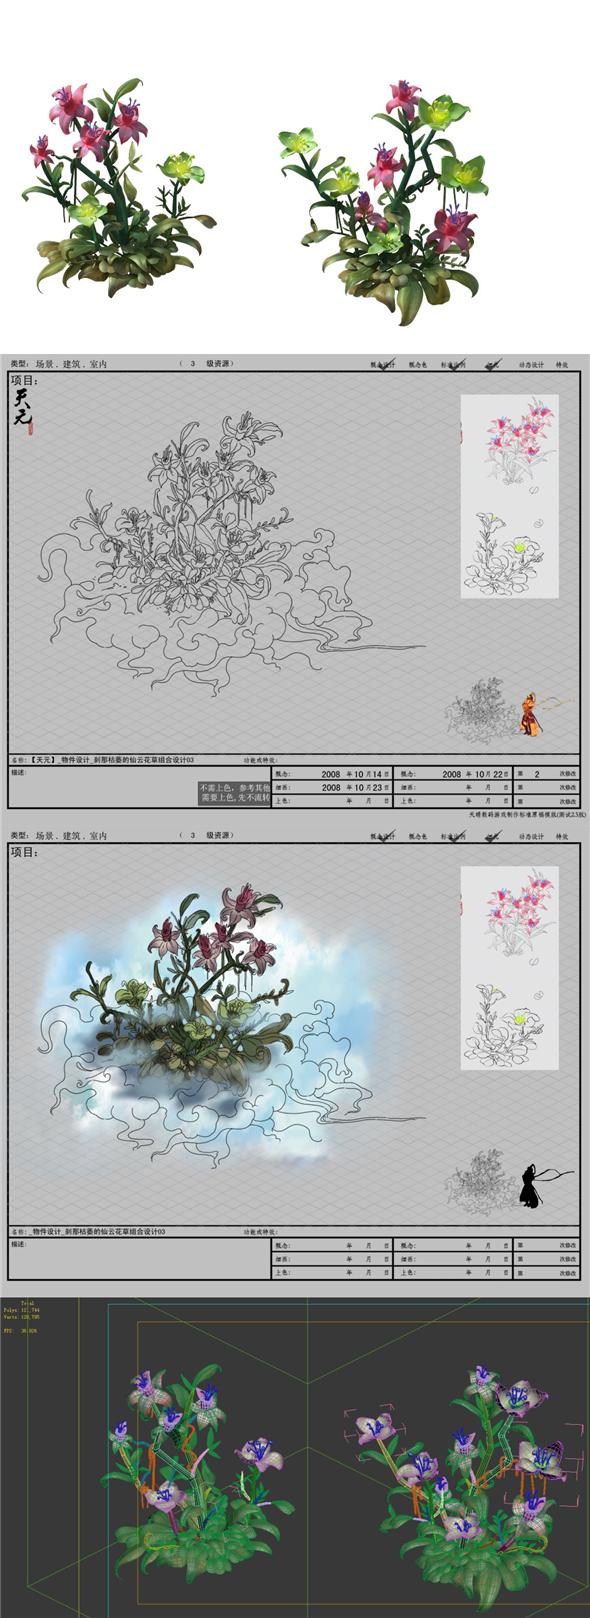 Game model - Hanging Garden - Xian Yun flowers combination 02 - 3DOcean Item for Sale